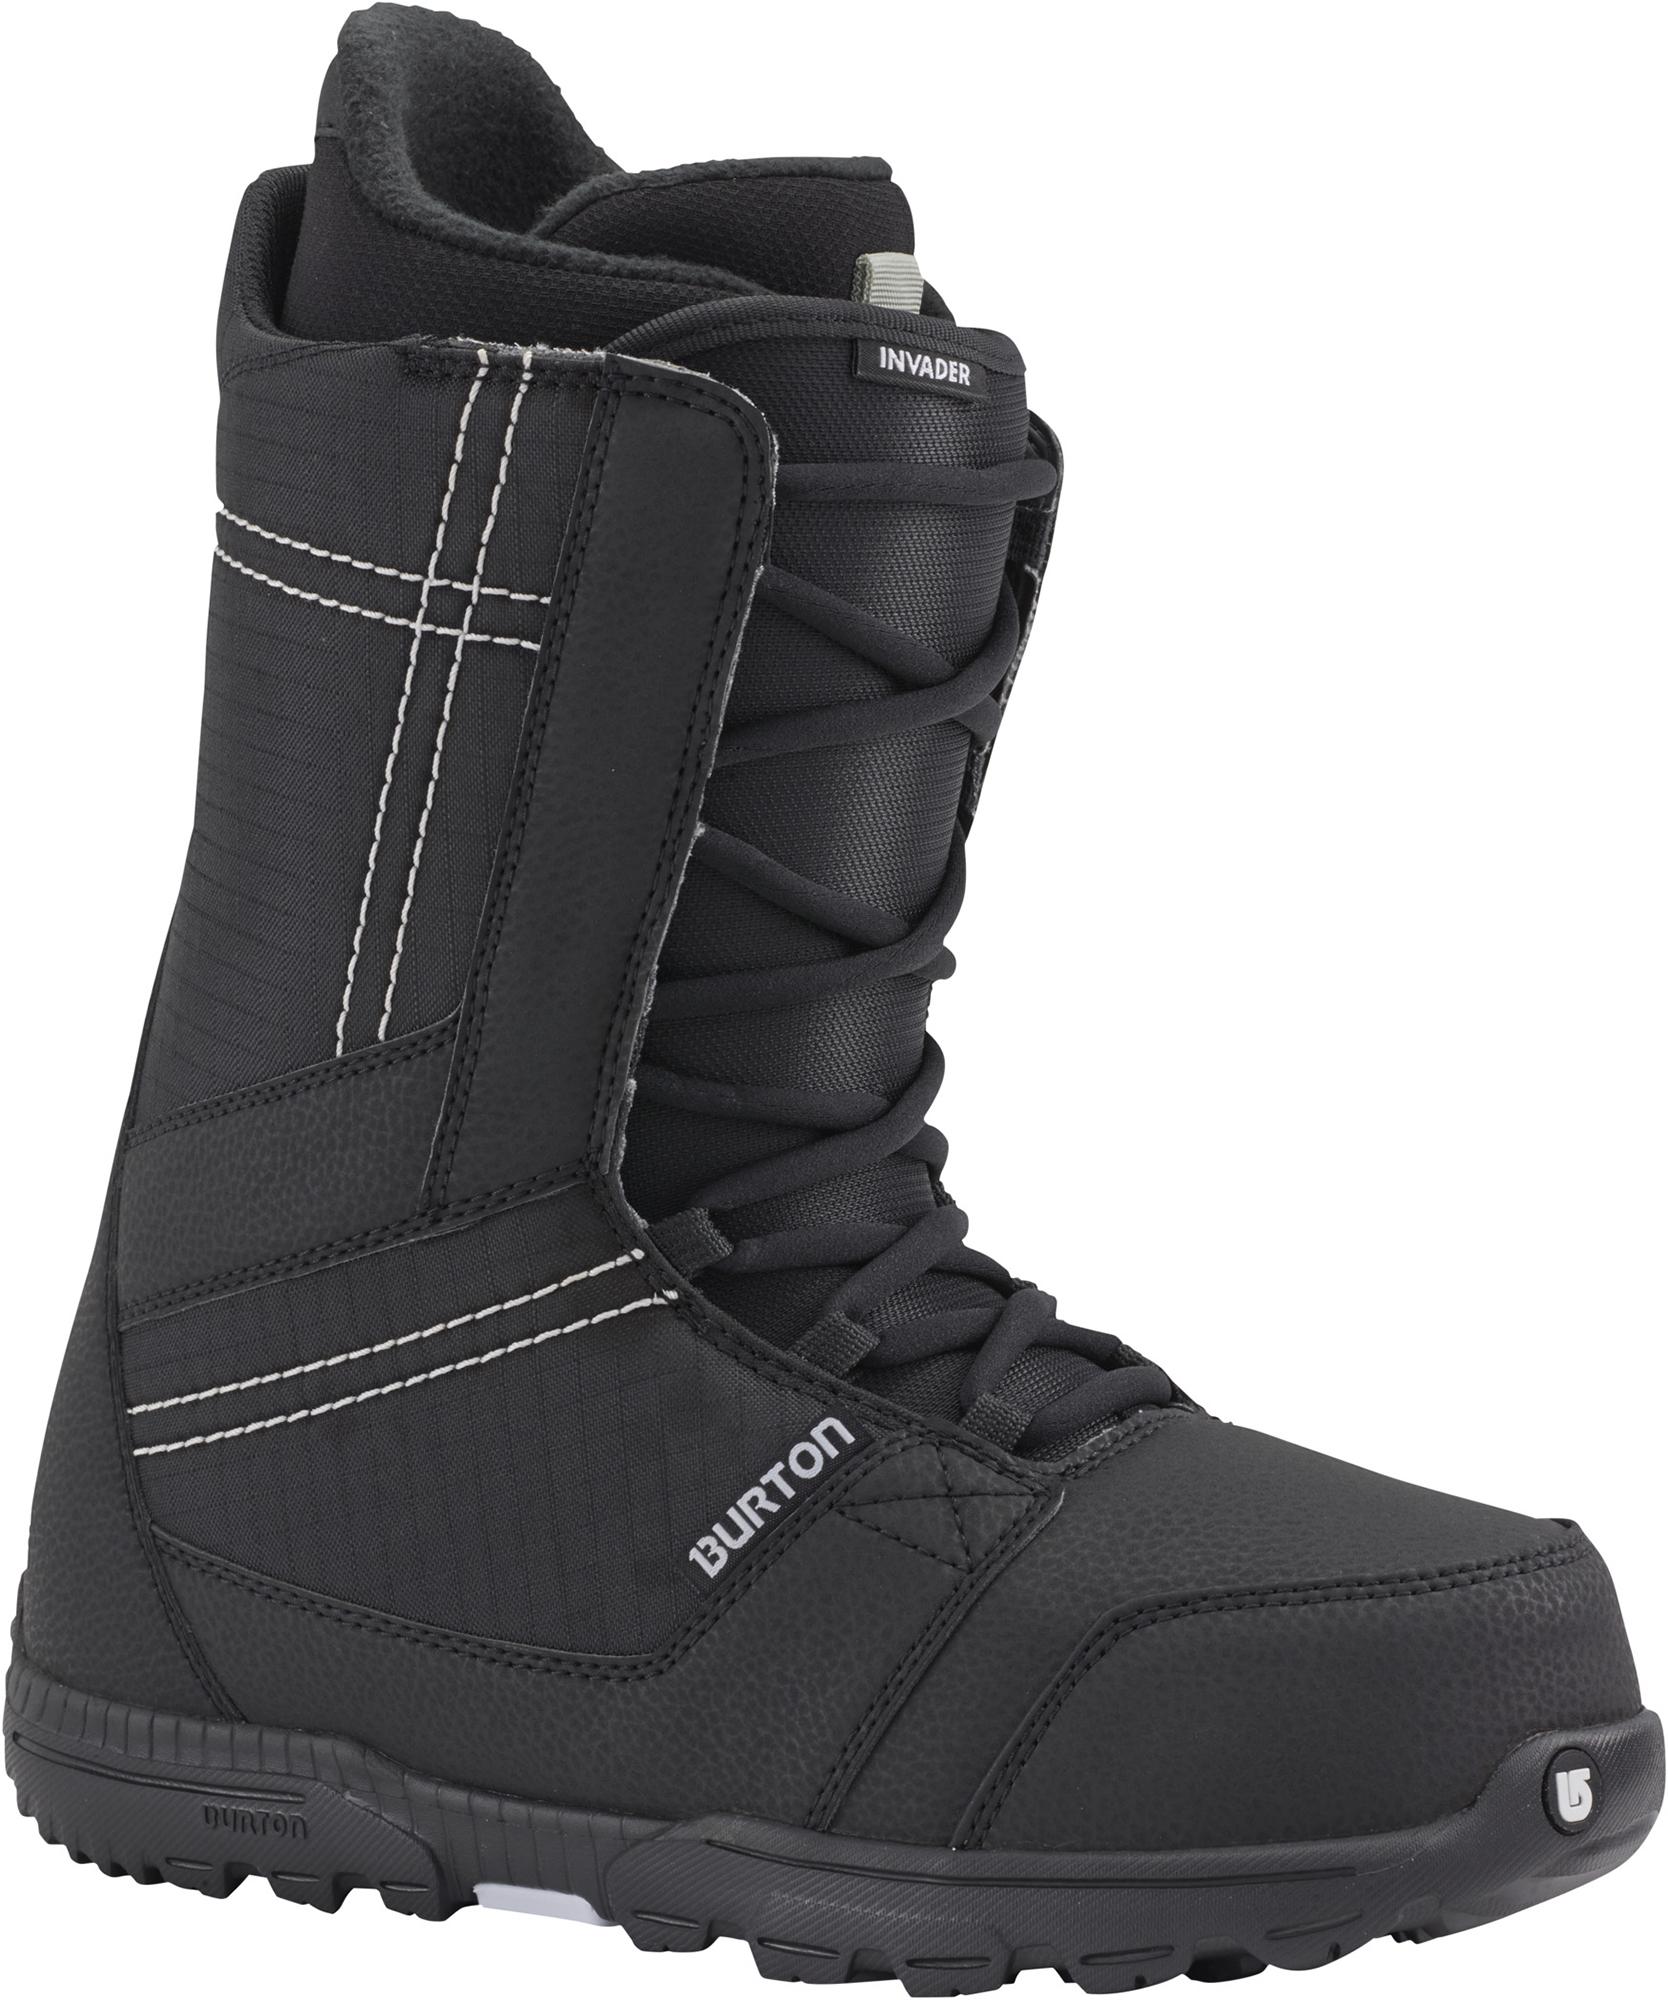 Burton Ботинки сноубордические Burton Invader, размер 41,5 брюки burton menswear london burton menswear london bu014emchoc6